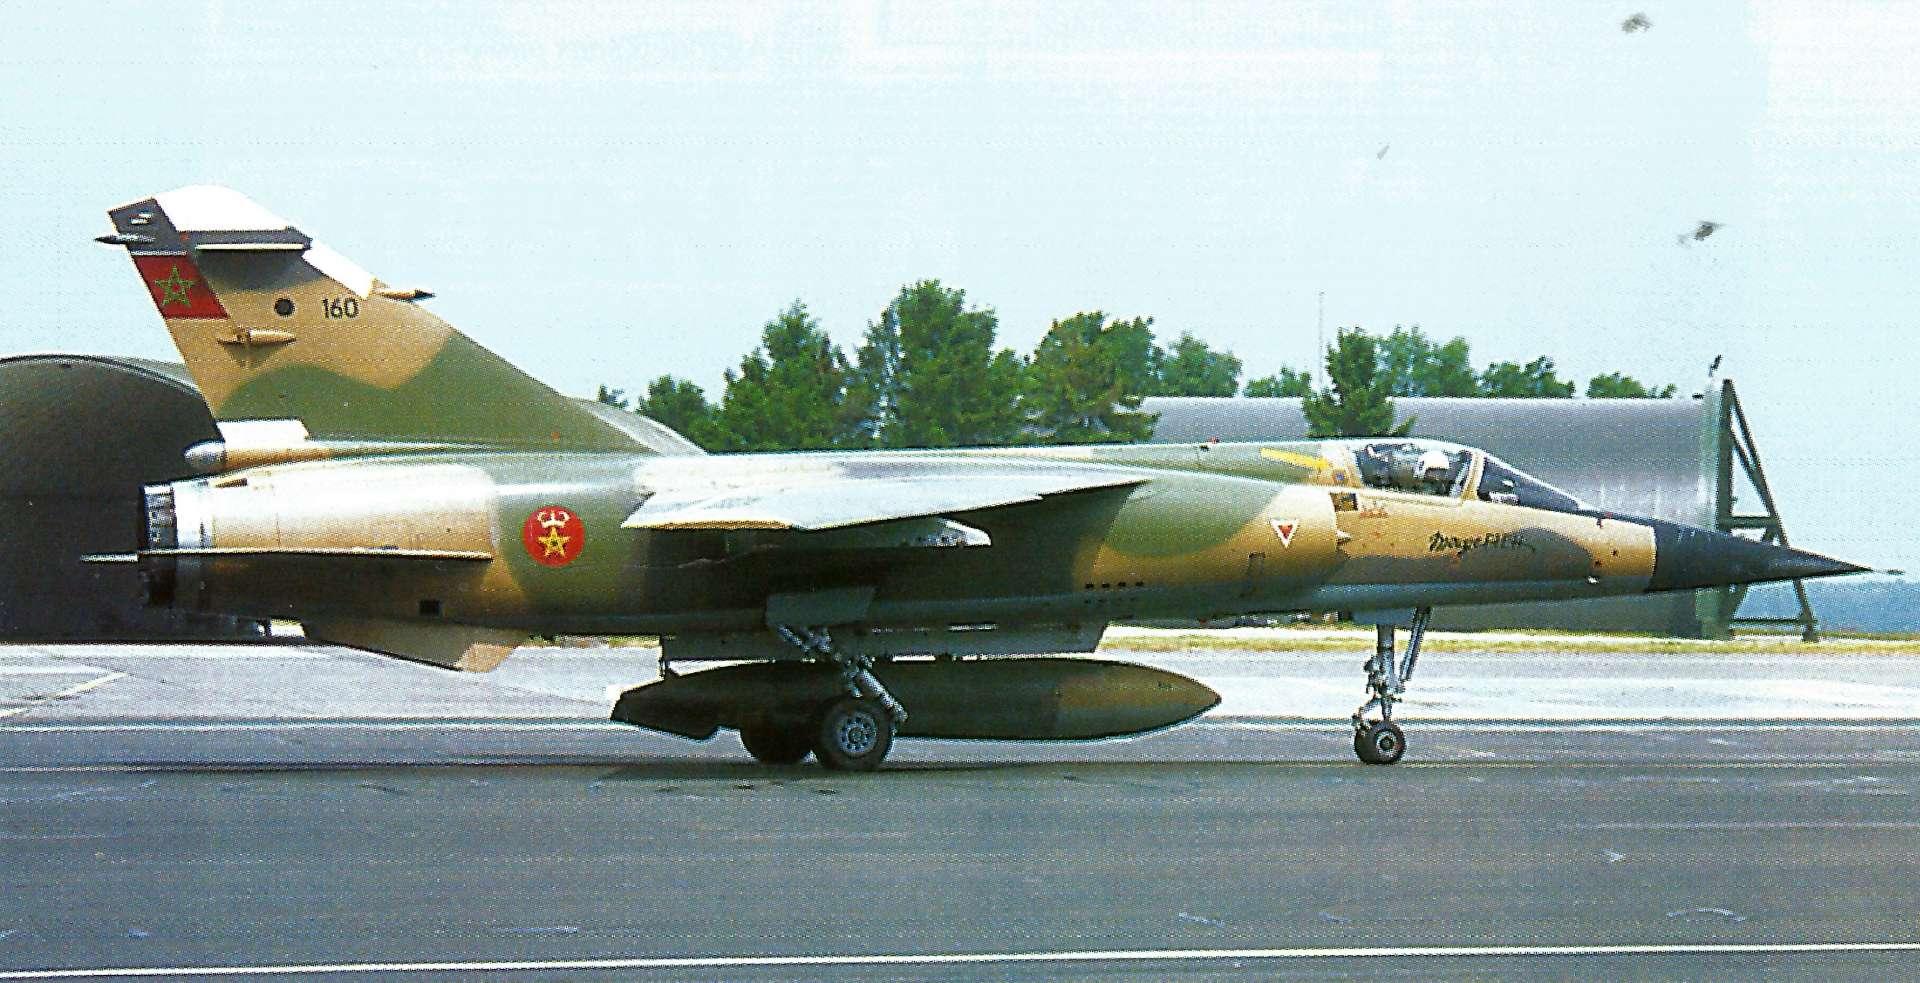 Échanges franco-marocain - Mirage F1 - 2003/2004 16011